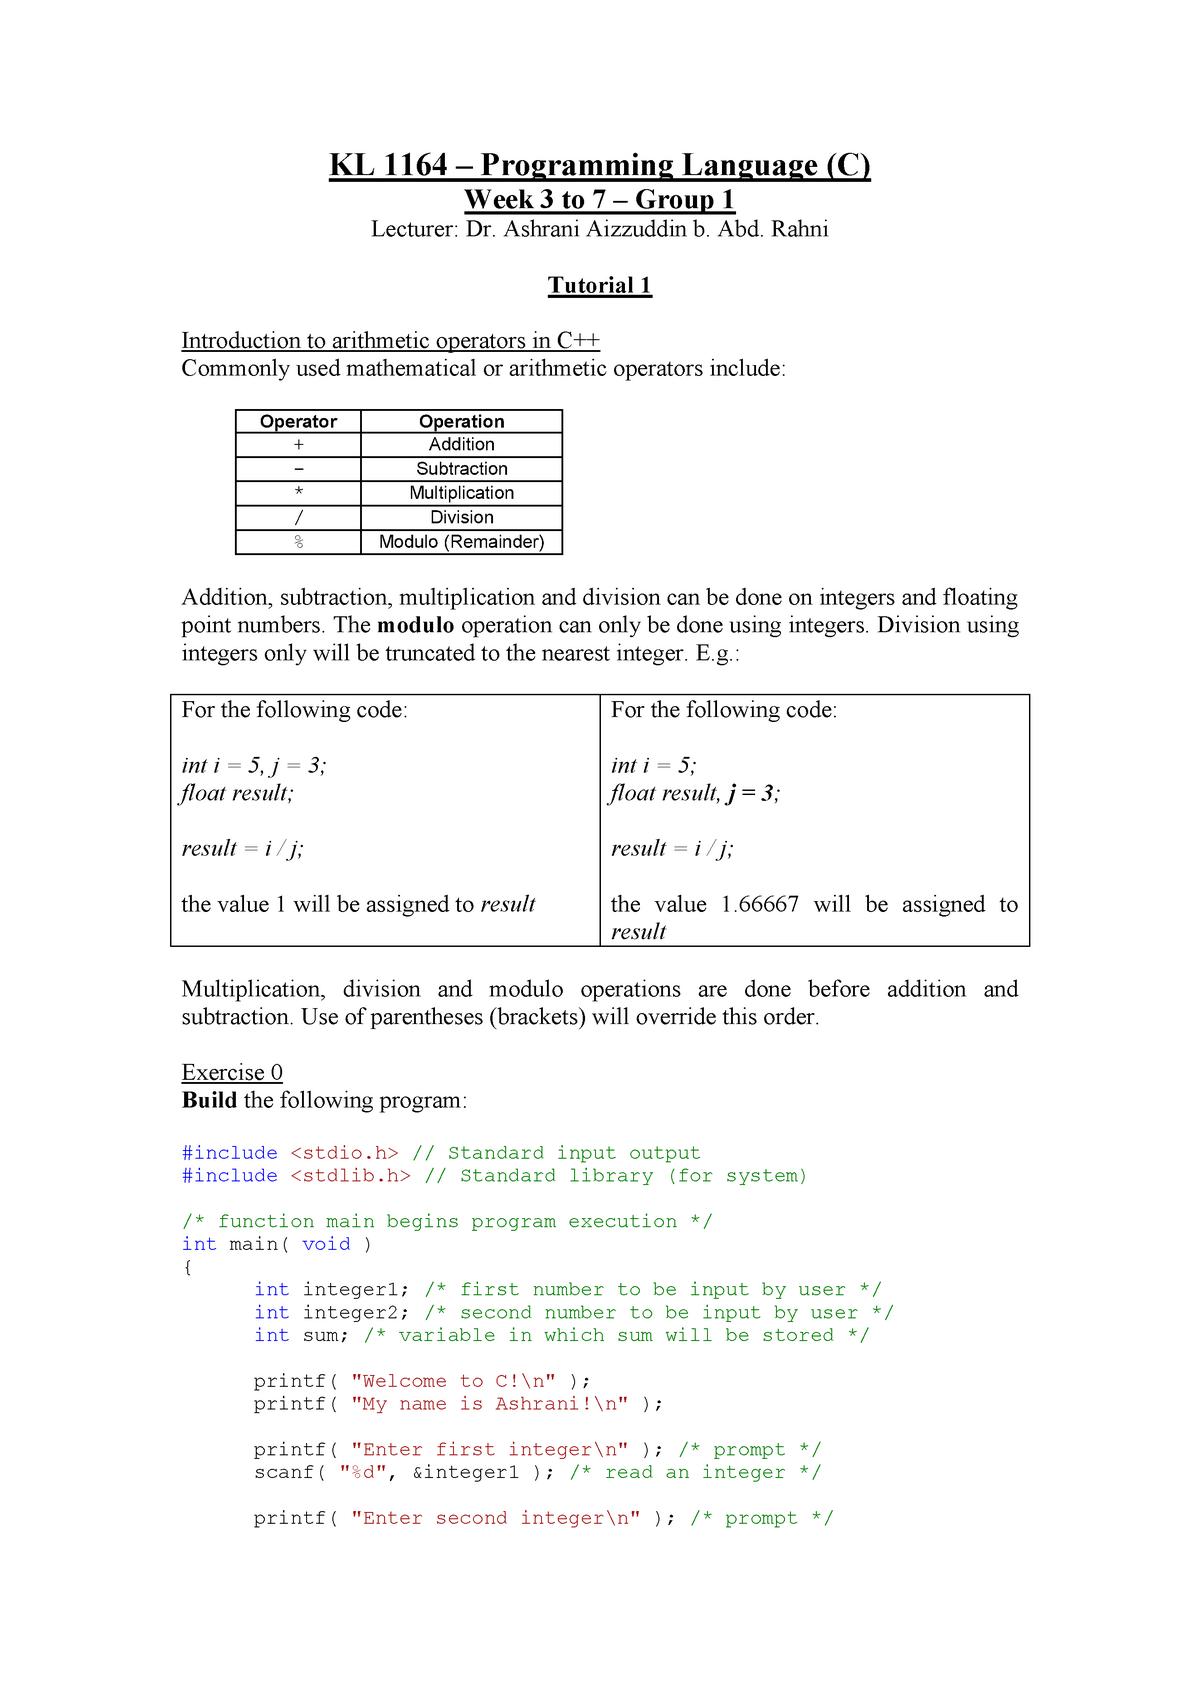 Tutorial 1 - Group 1 - KKKL1163: Programming Language - StuDocu